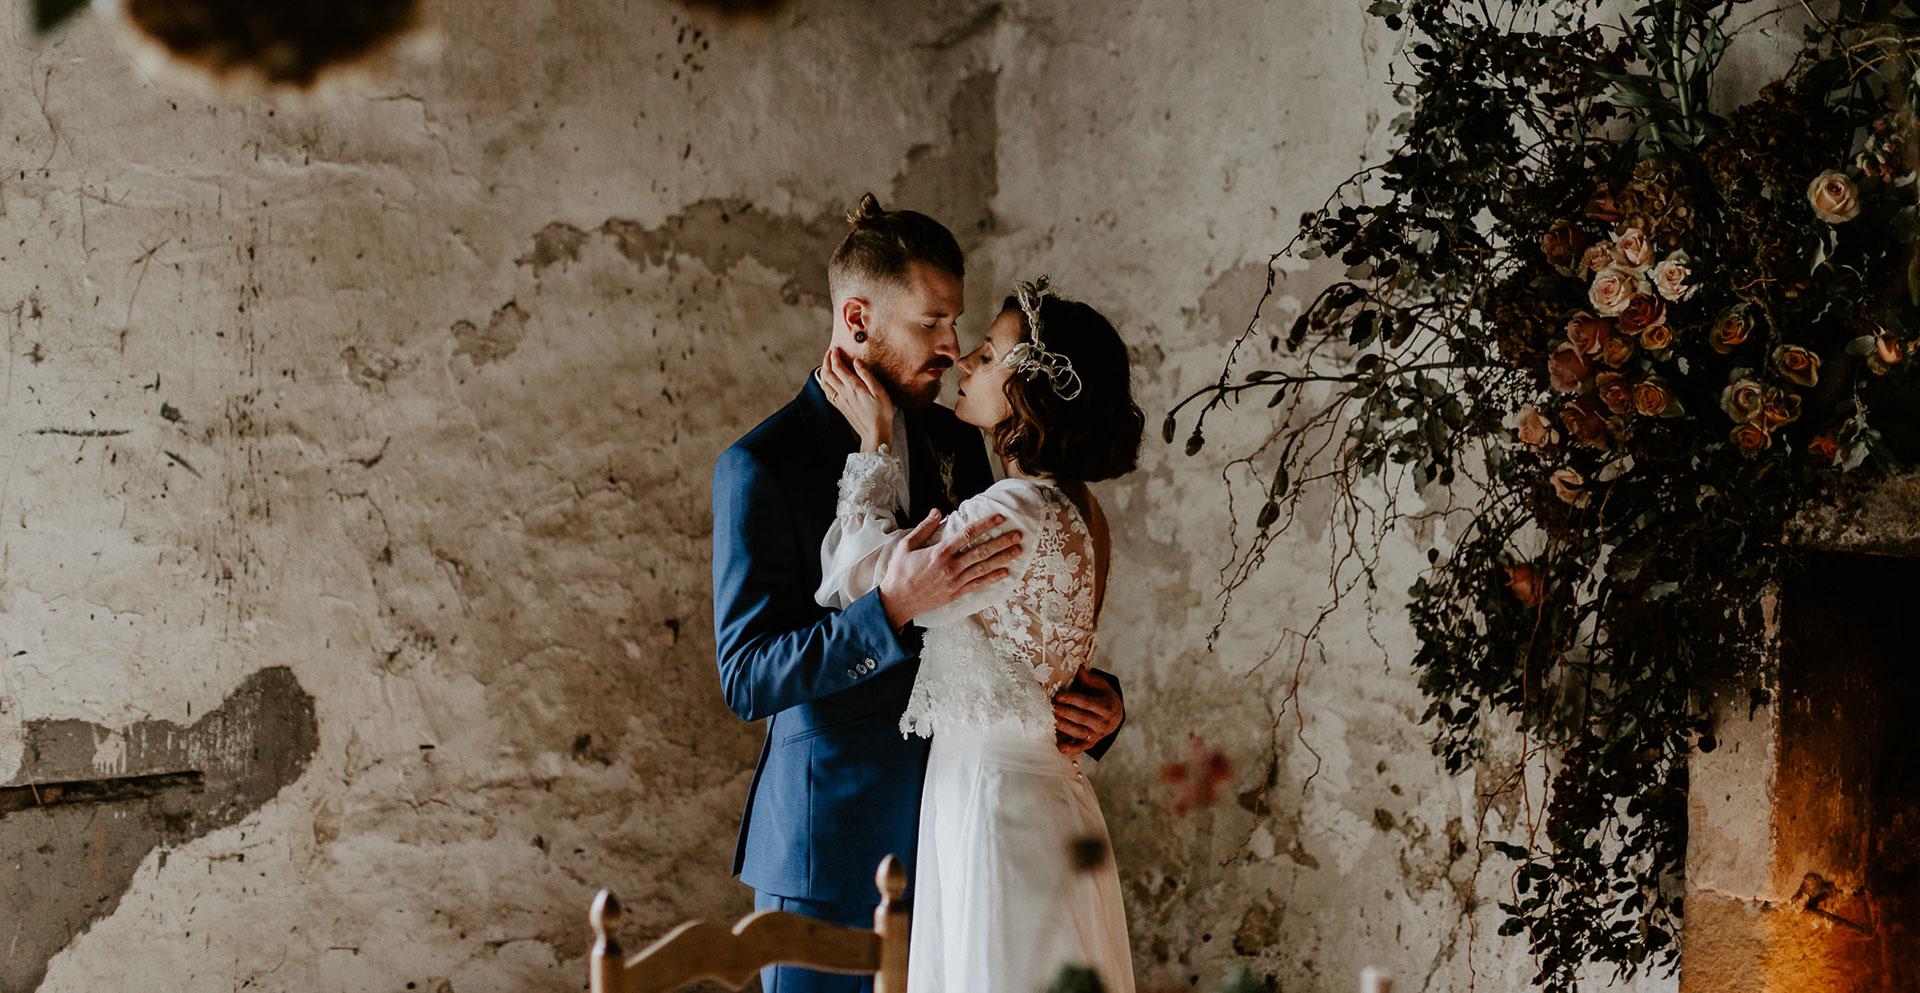 fleuriste-mariage-nantes-naturel-sauvage-poetique-inspiration-lamarieeauxpiedsnus-73-1.jpg